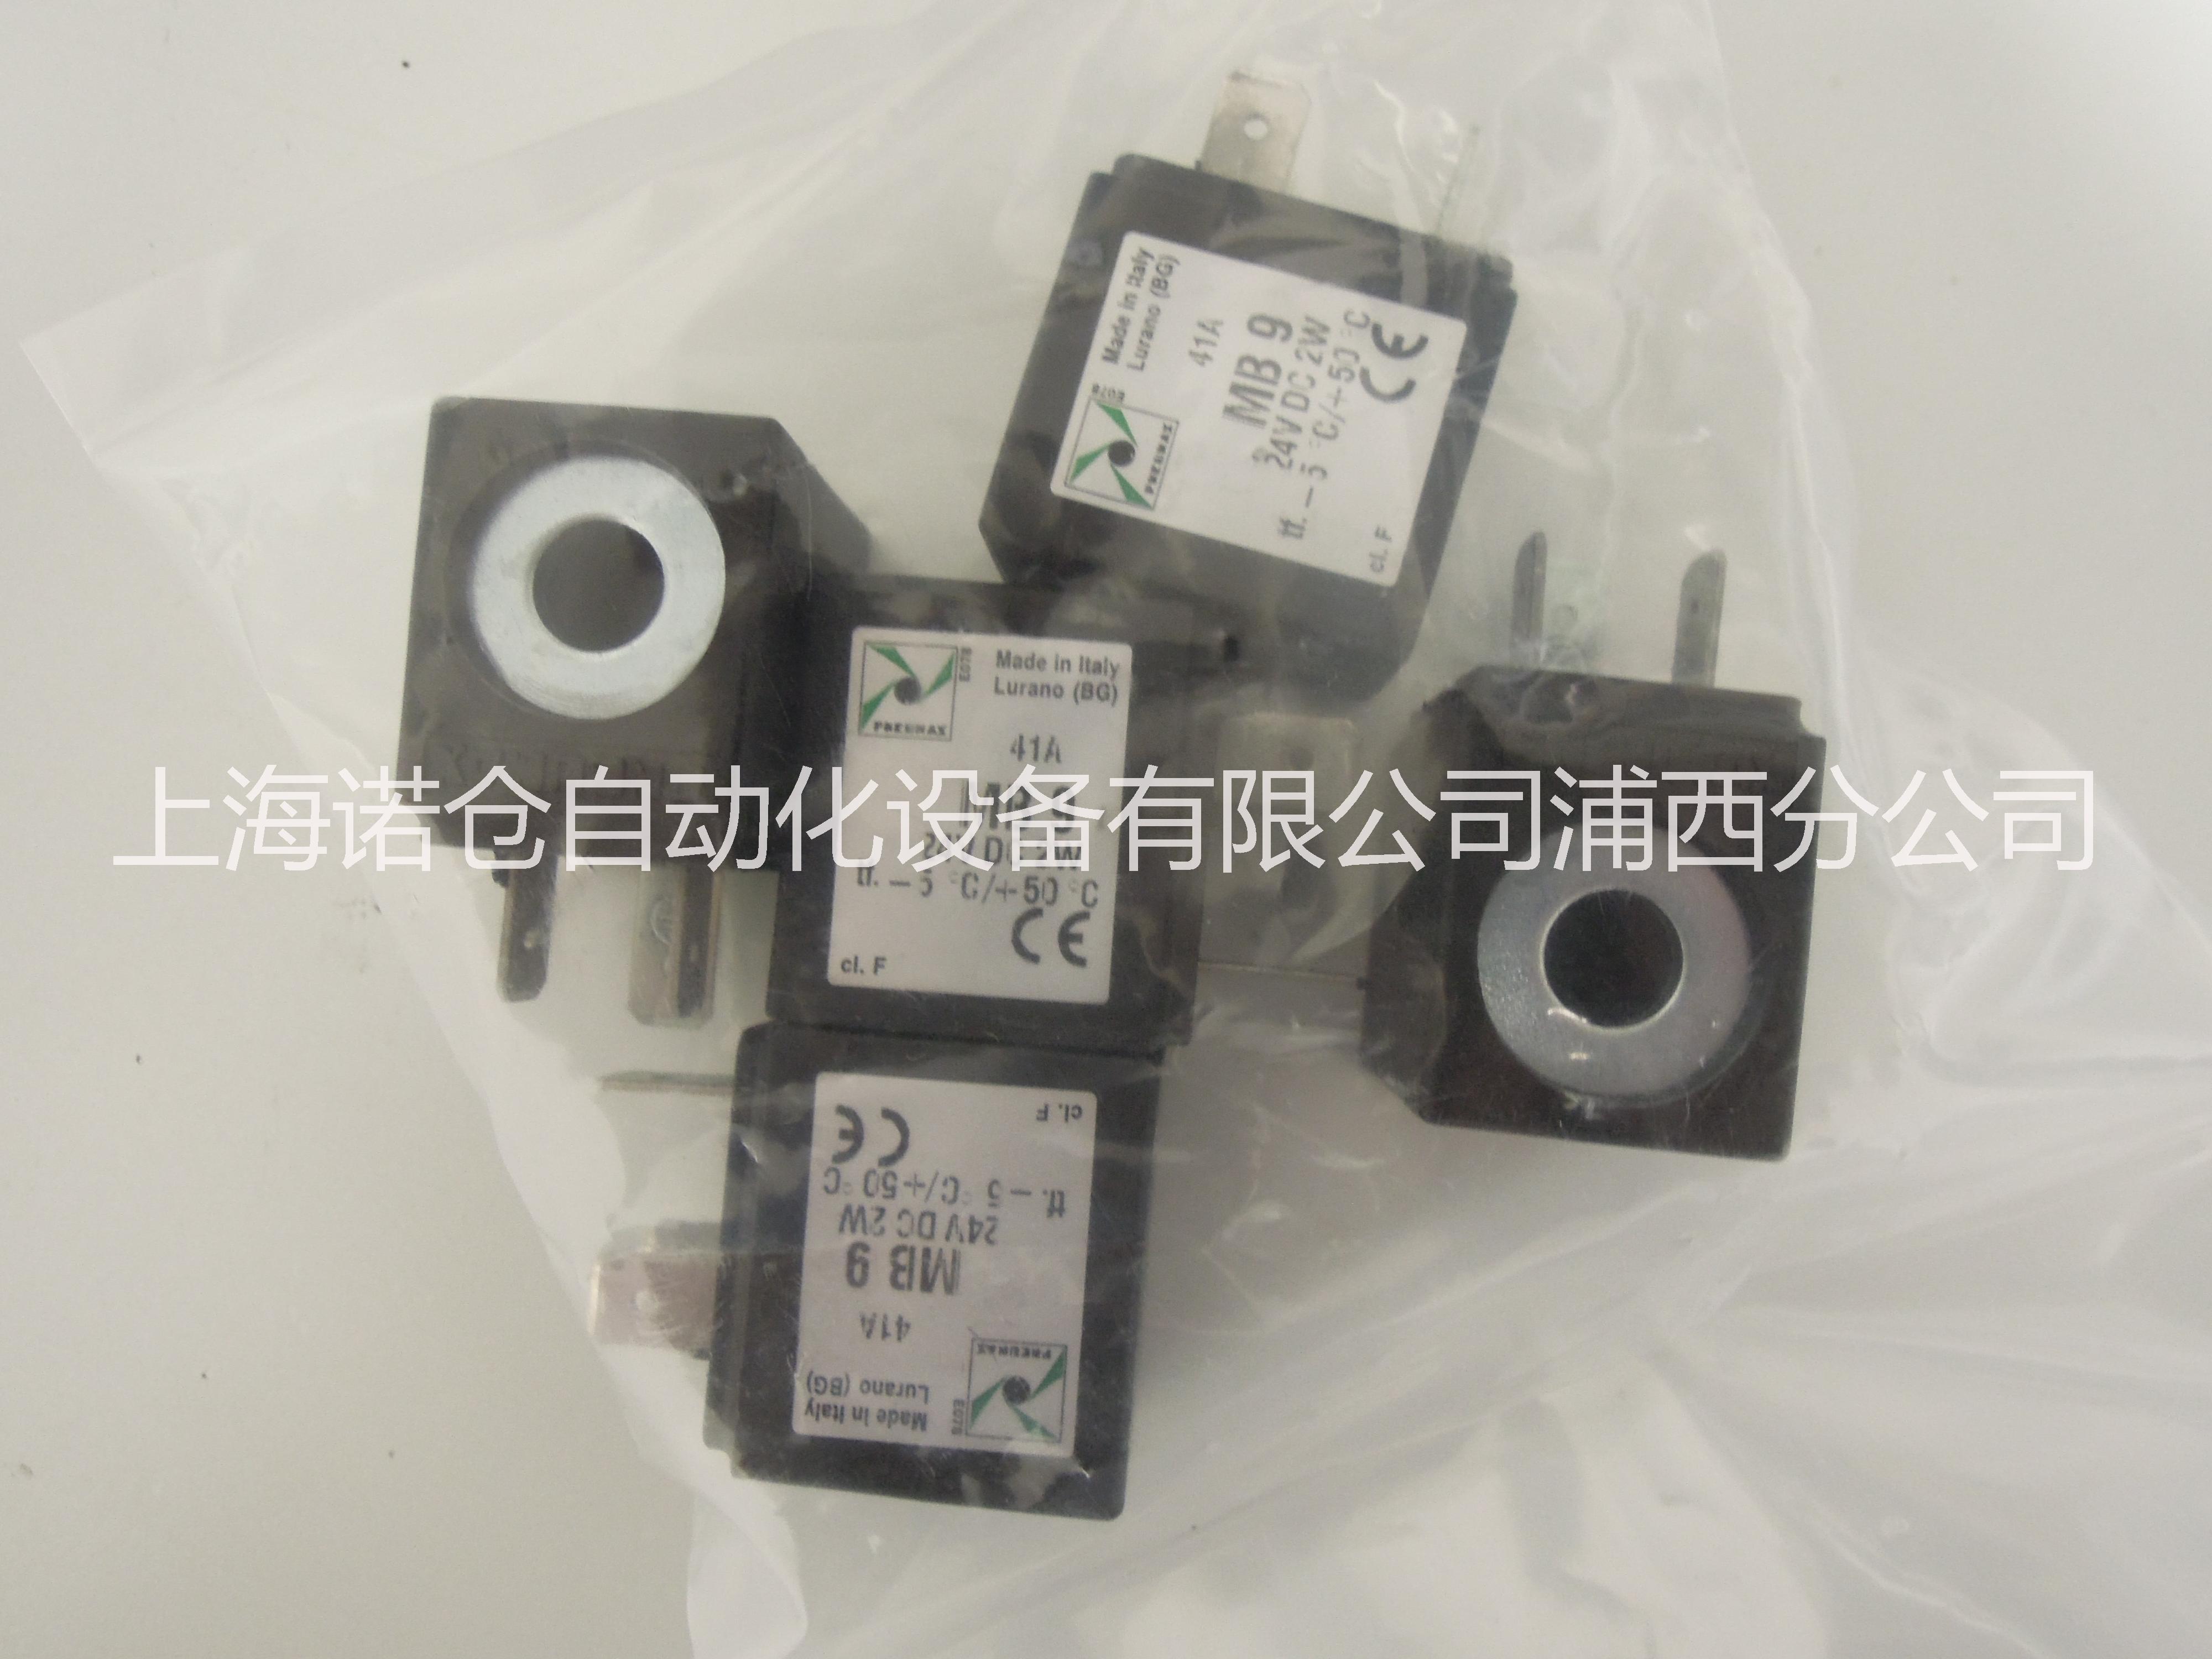 现货供应MB11 24VDC,MB22 110V,PNEUMAX线圈MB9 24VDC